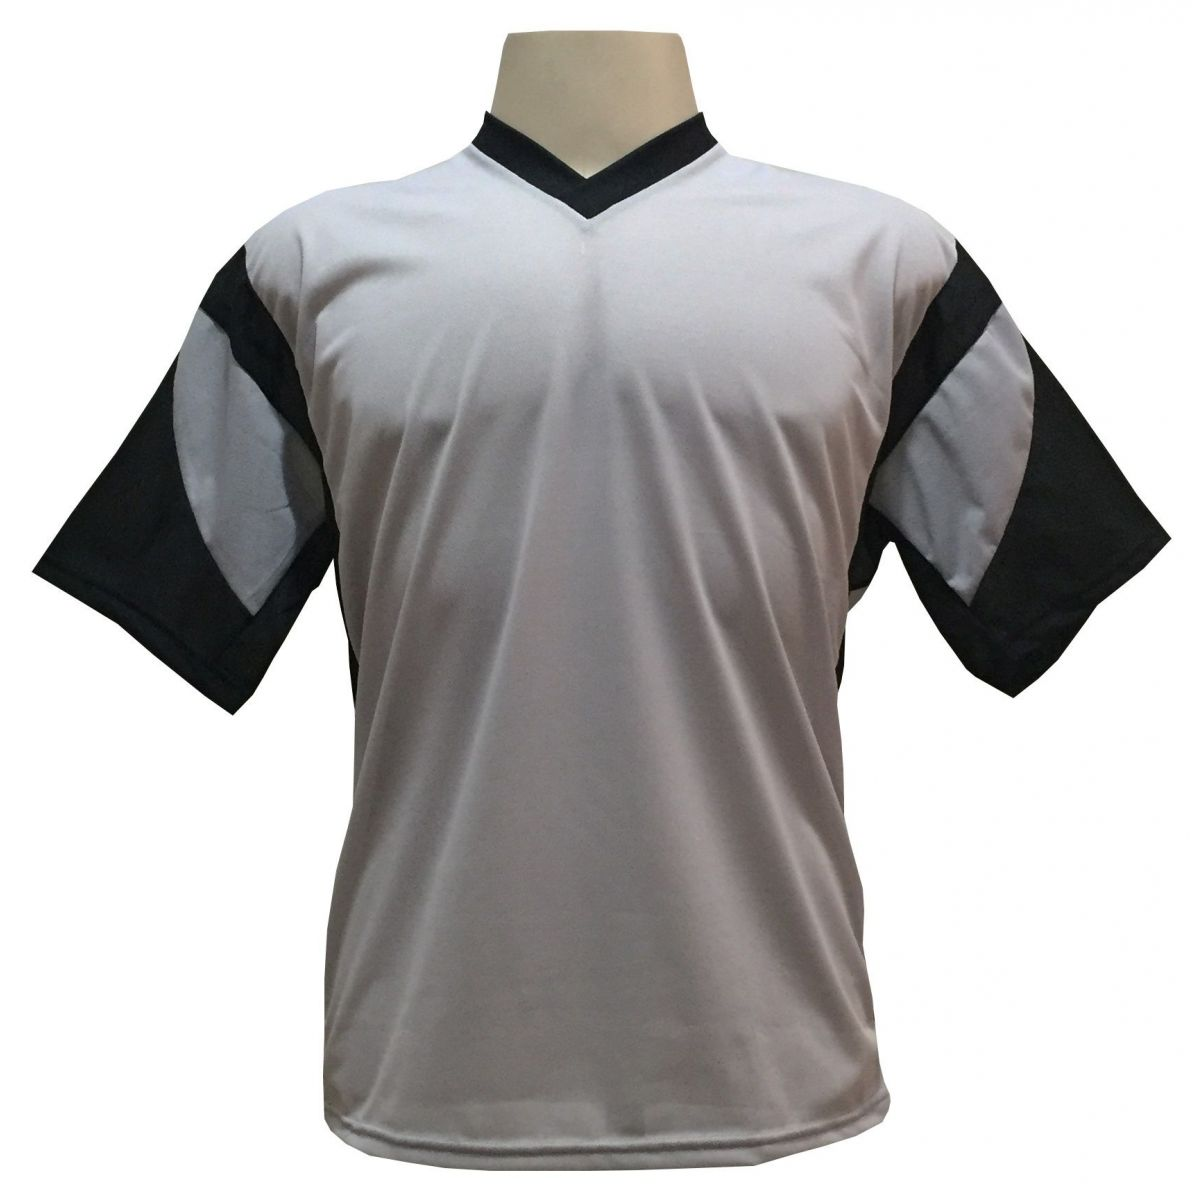 b0793ac380 uniforme